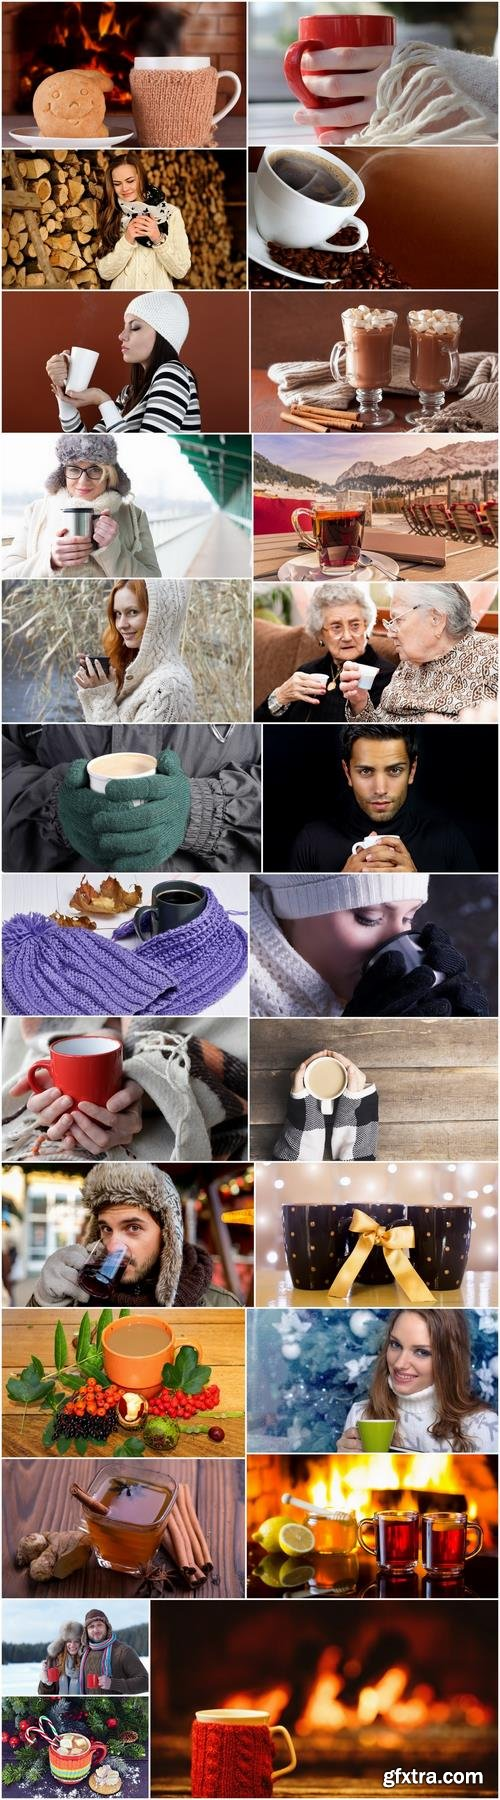 Warm drink tea boiling coffee 25 HQ Jpeg